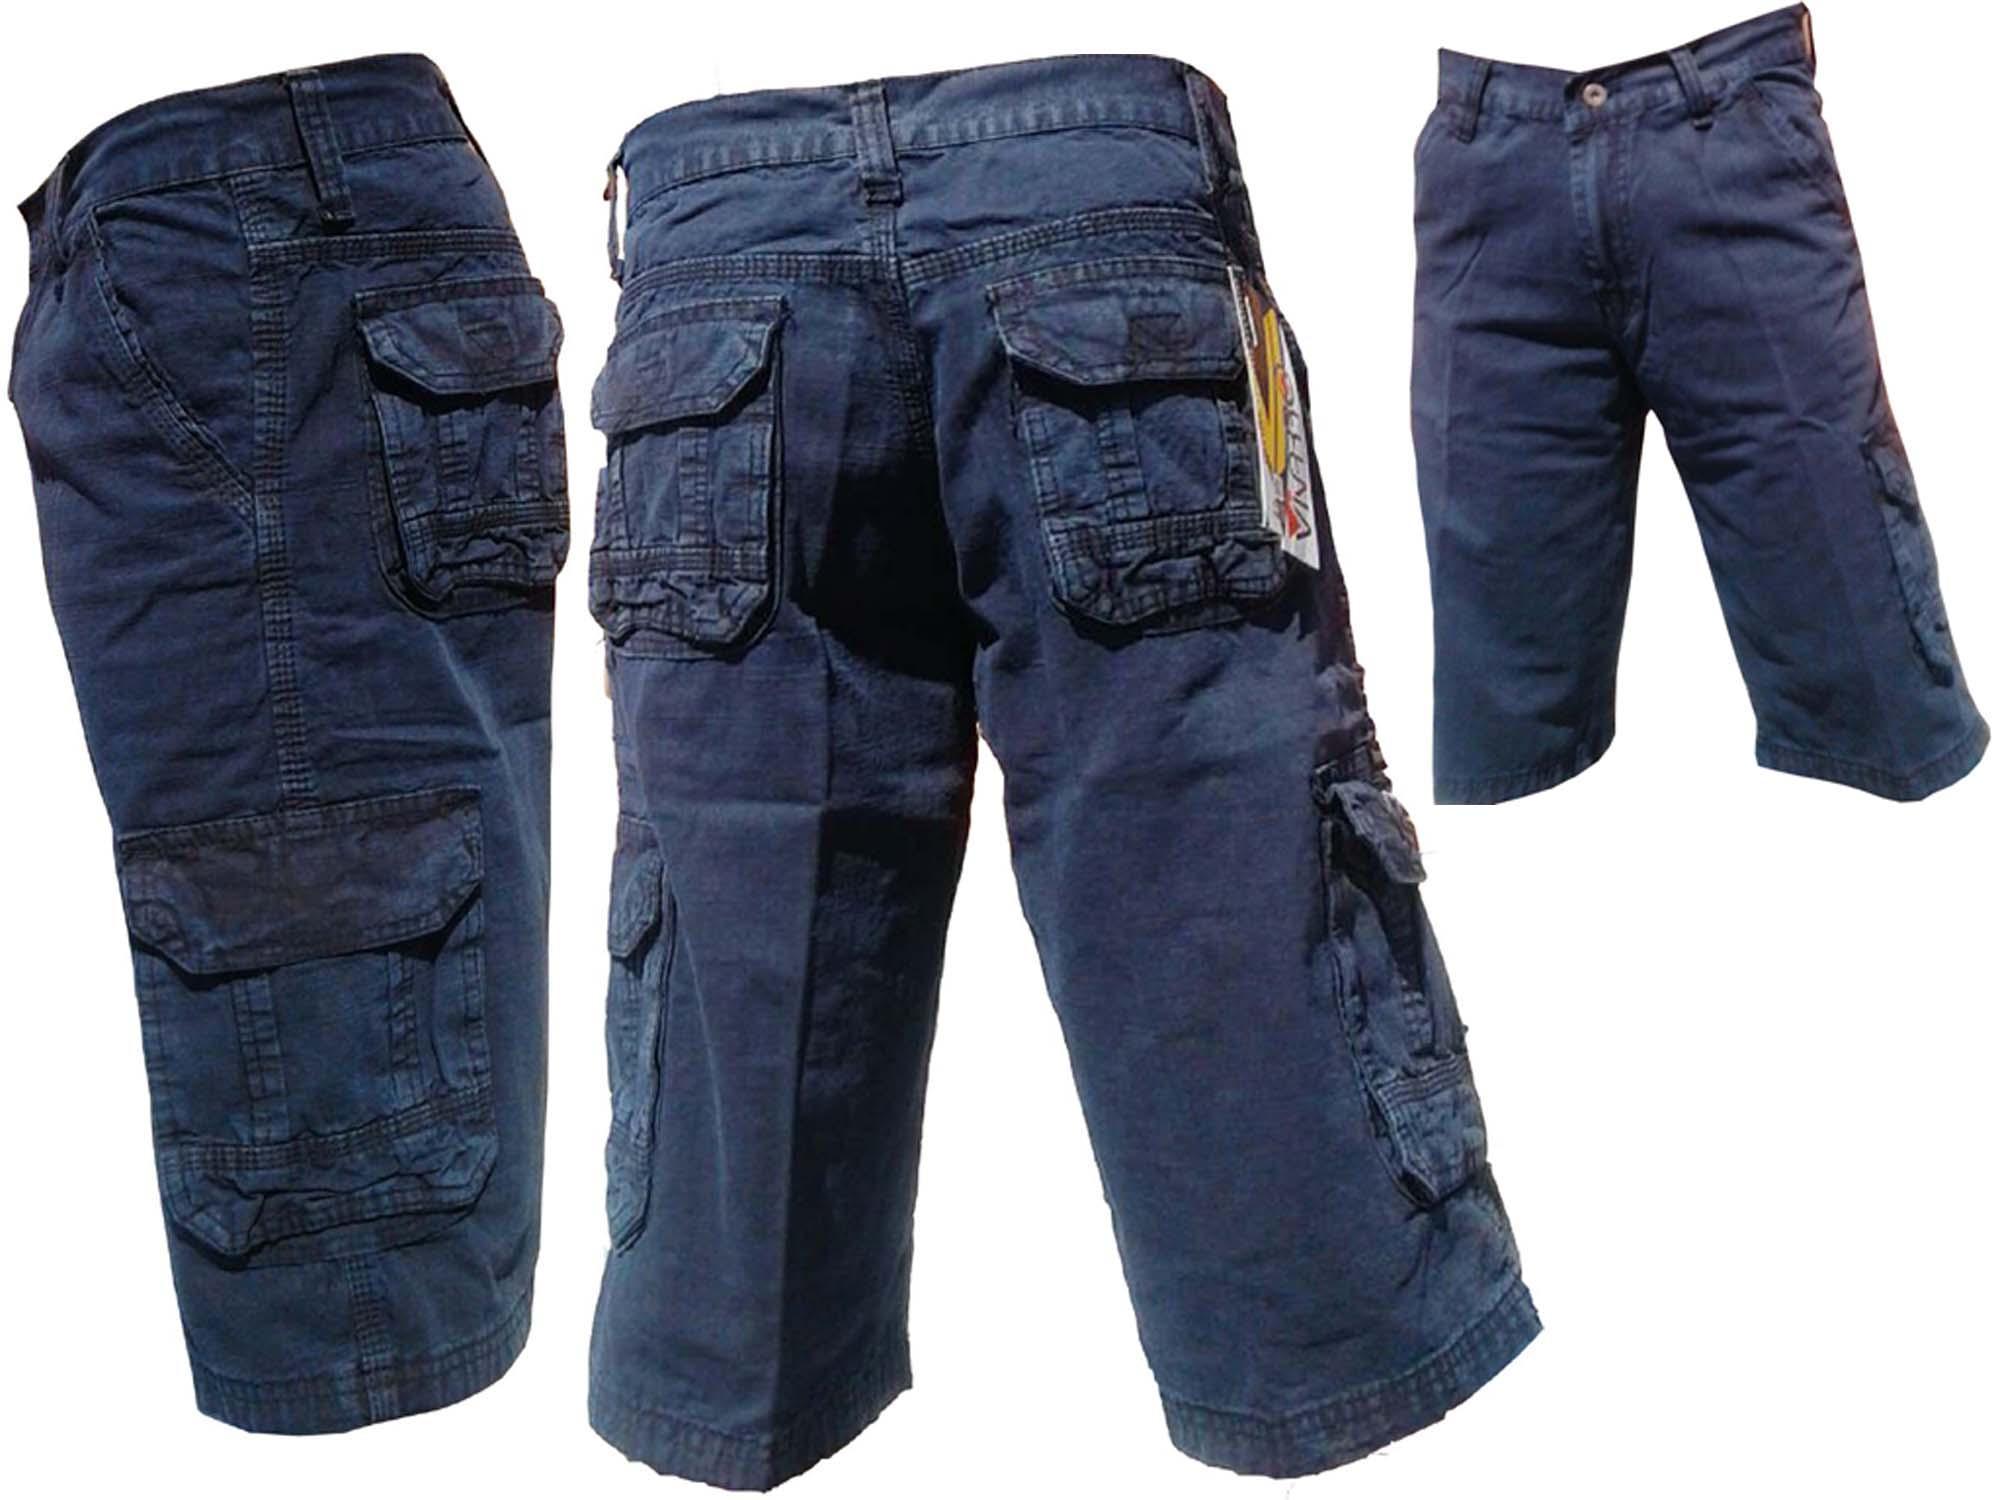 Fitur Diky Noval Celana Pendek Pria 3 4 Cargo Casual Fashion